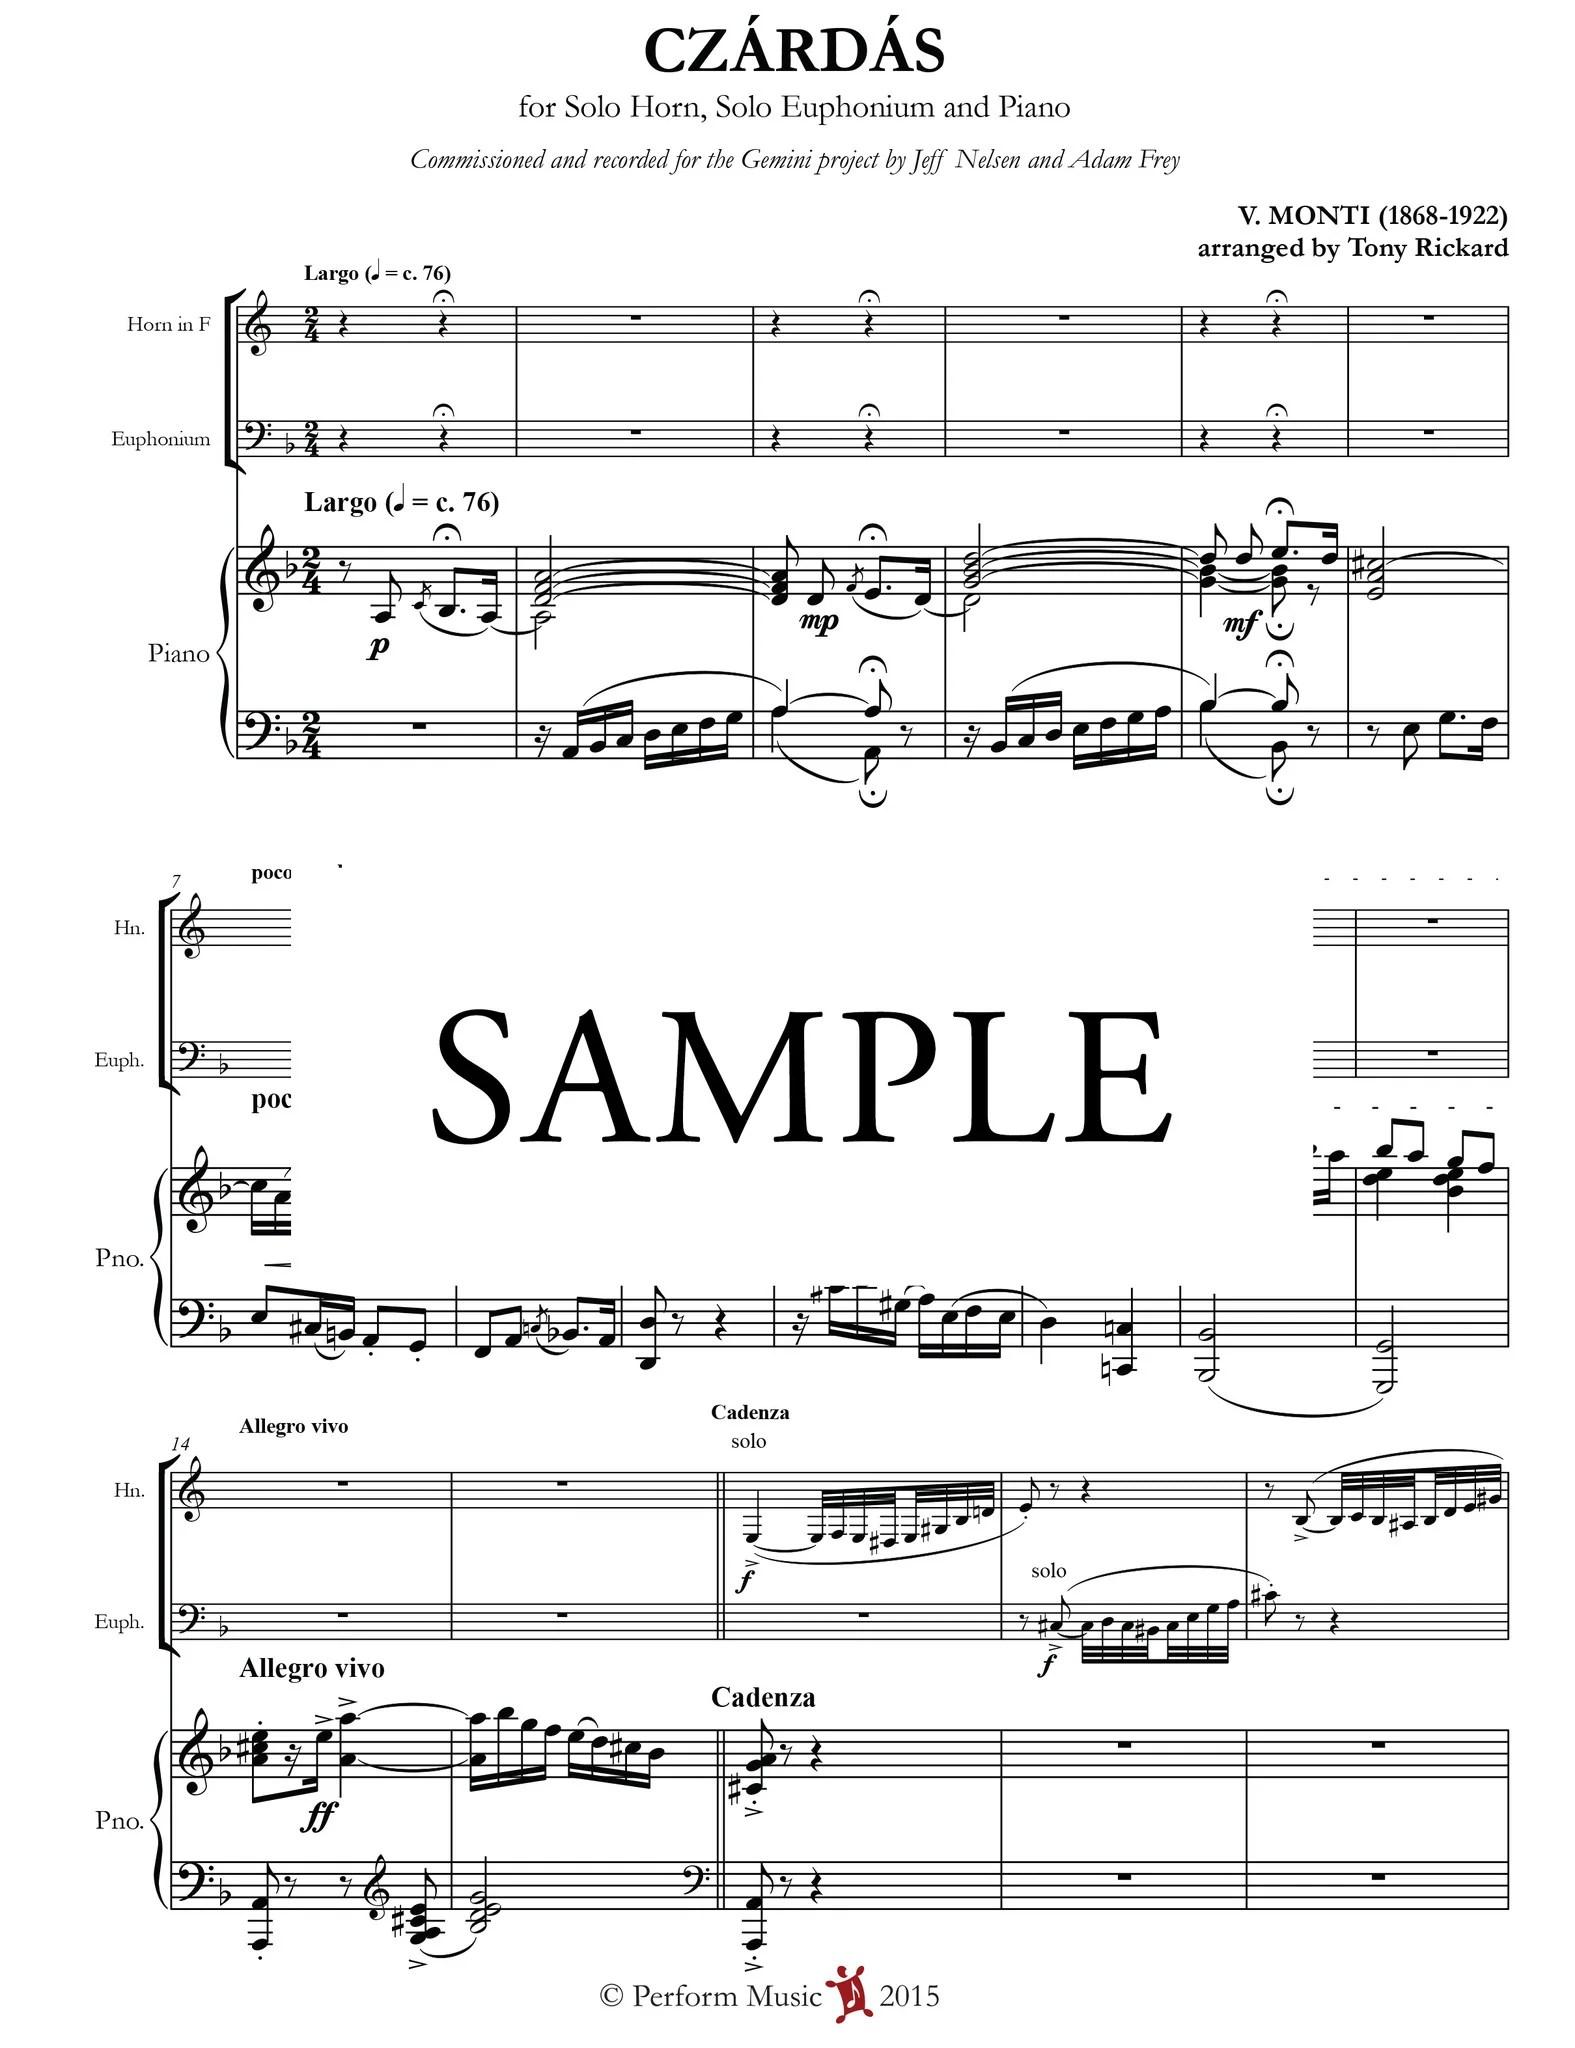 medium resolution of czardas for horn euphonium and piano